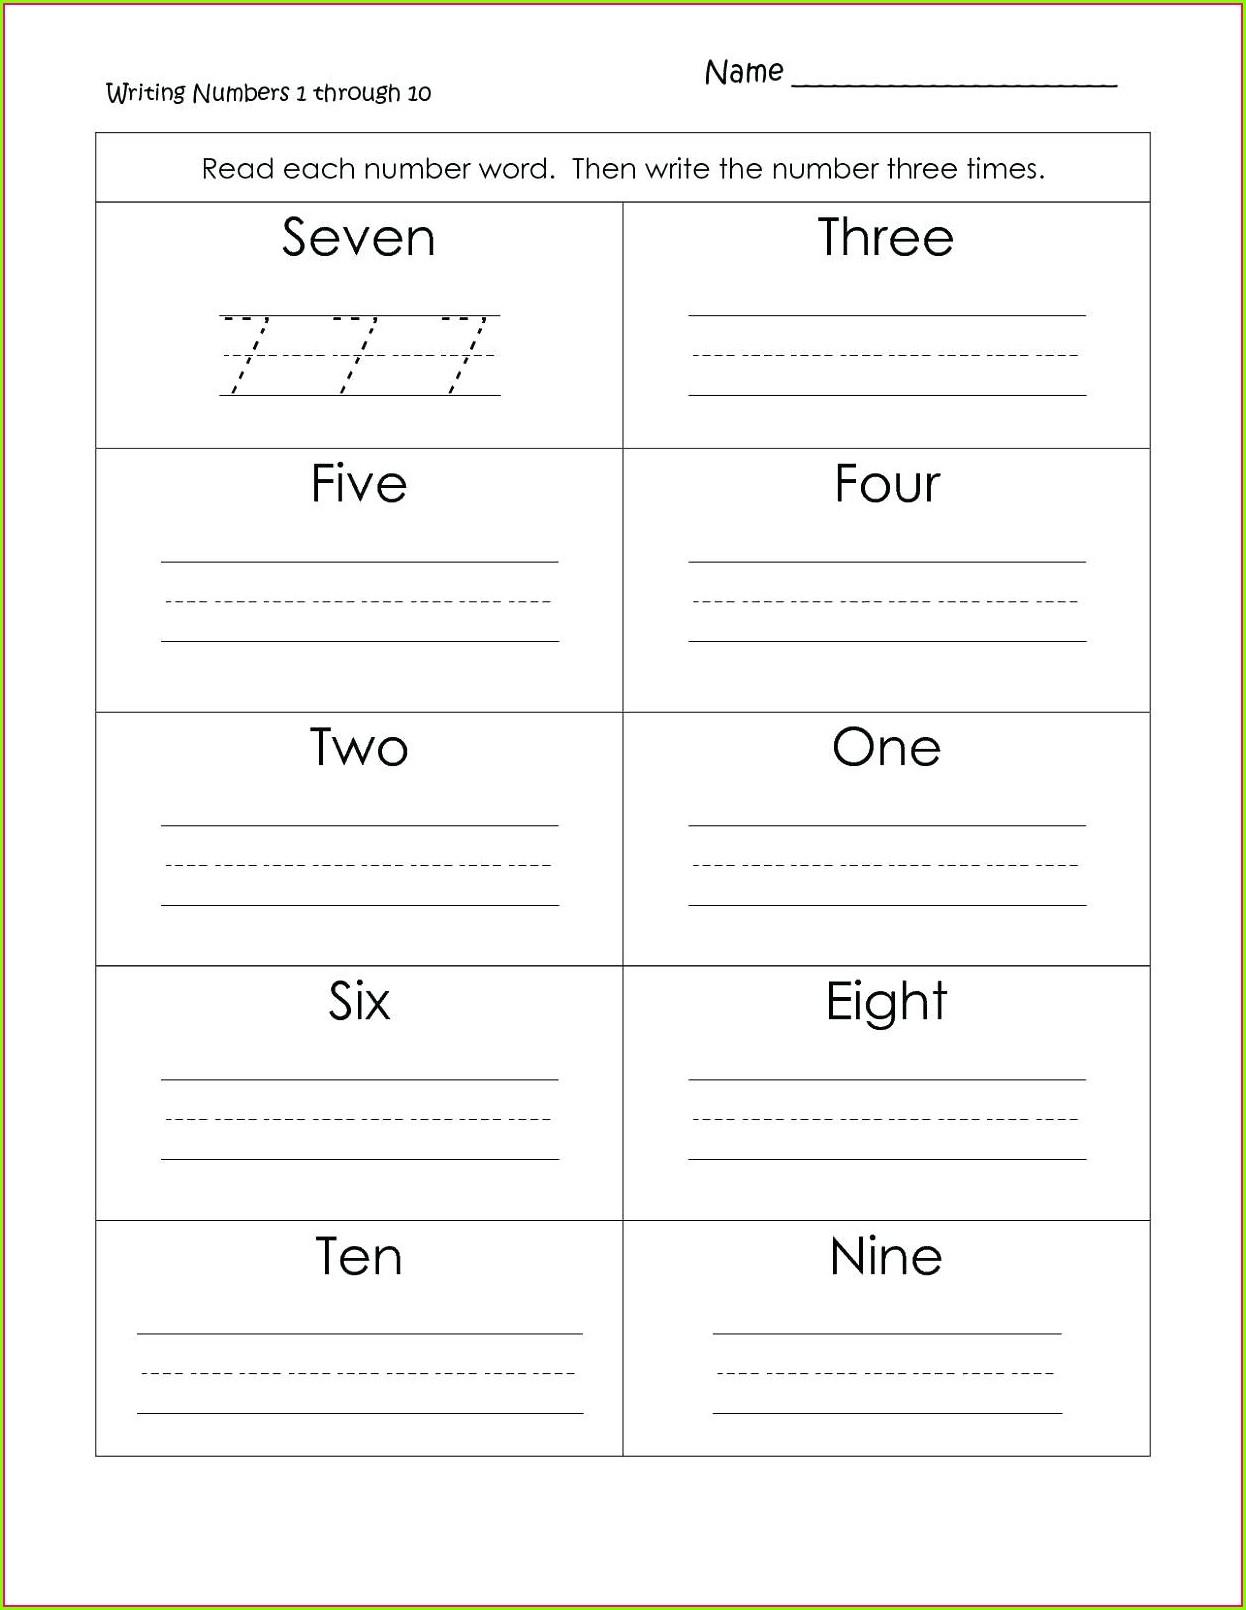 Sentences Writing Worksheets For 3rd Grade Worksheet